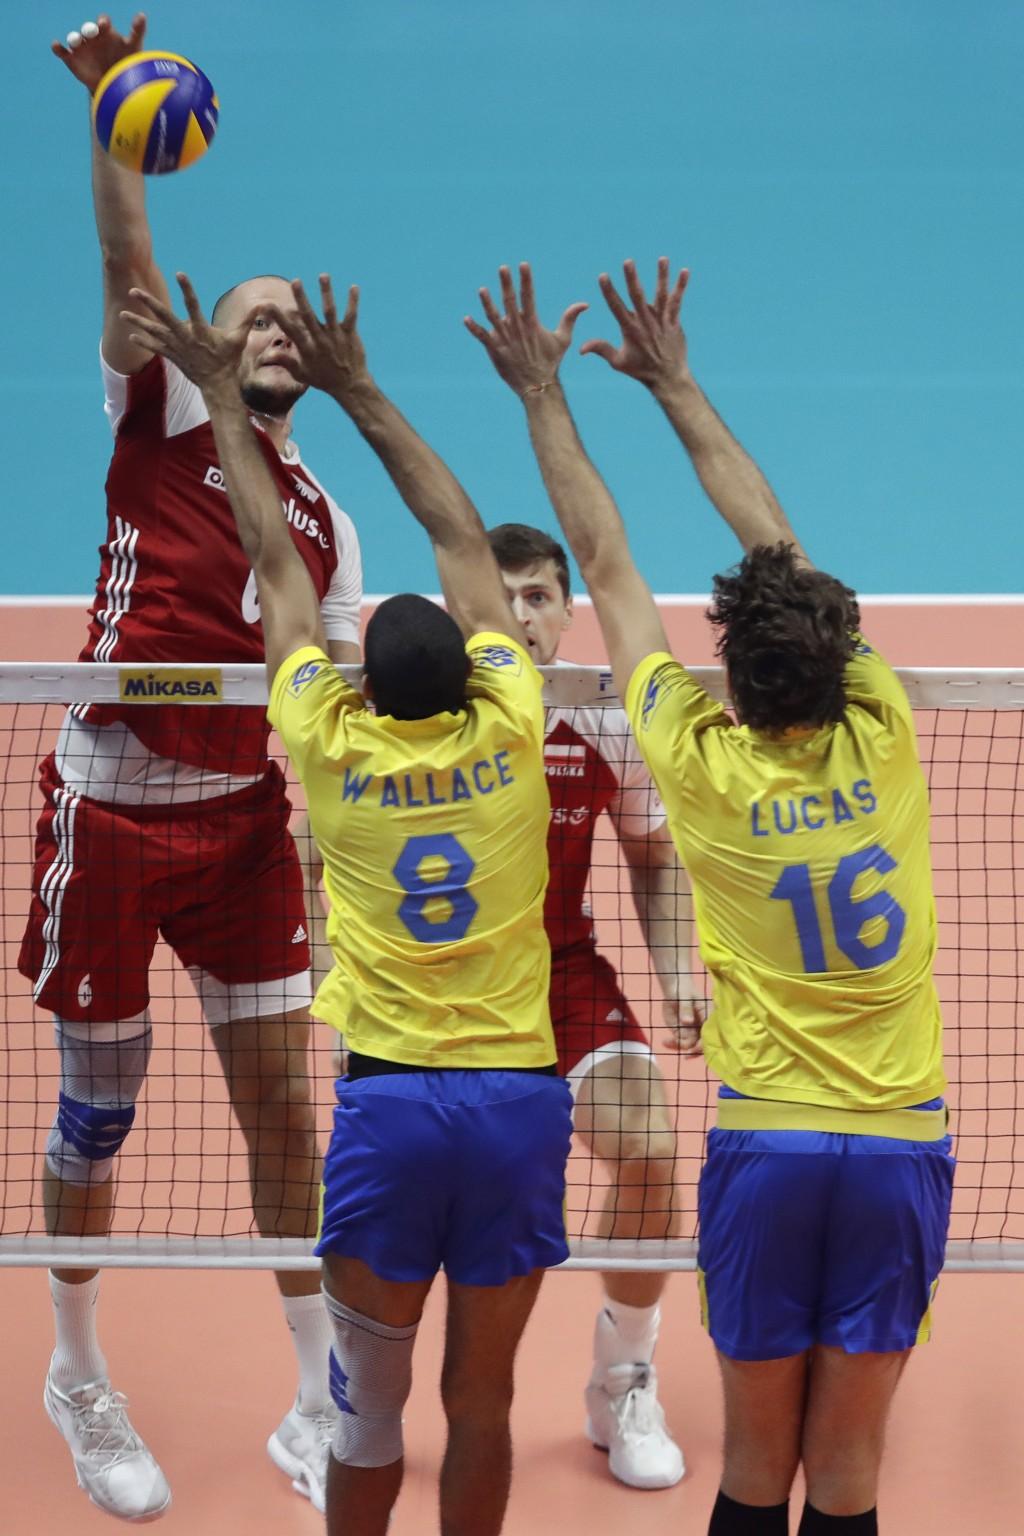 Poland's Bartosz Kurek hits the ball as Brazil's Wallace De Souza, left, and Brazil's Lucas Saatkamp, right, jump to block the ball during the Men's W...